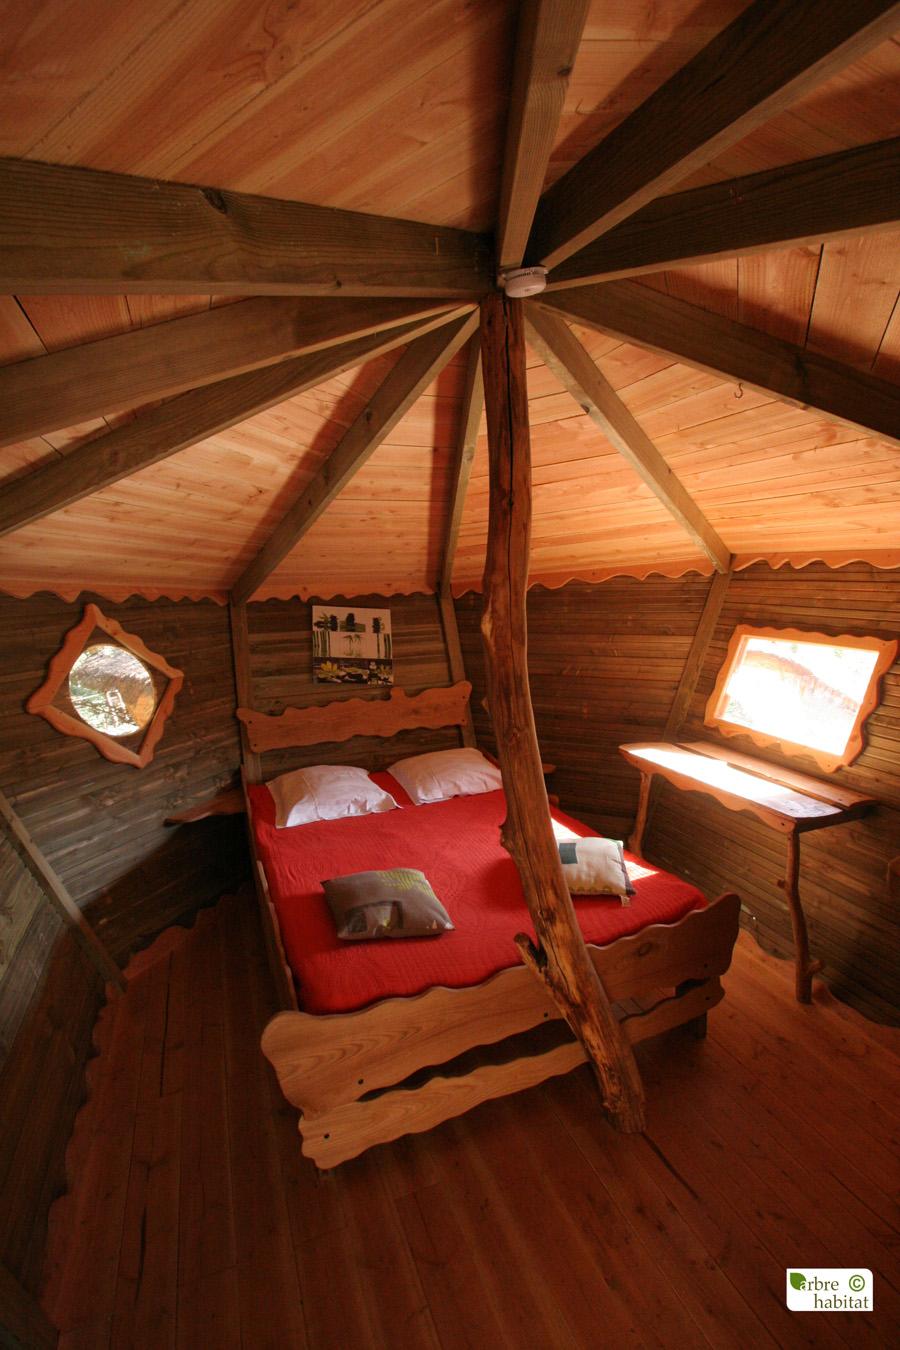 prestations arbre habitat. Black Bedroom Furniture Sets. Home Design Ideas